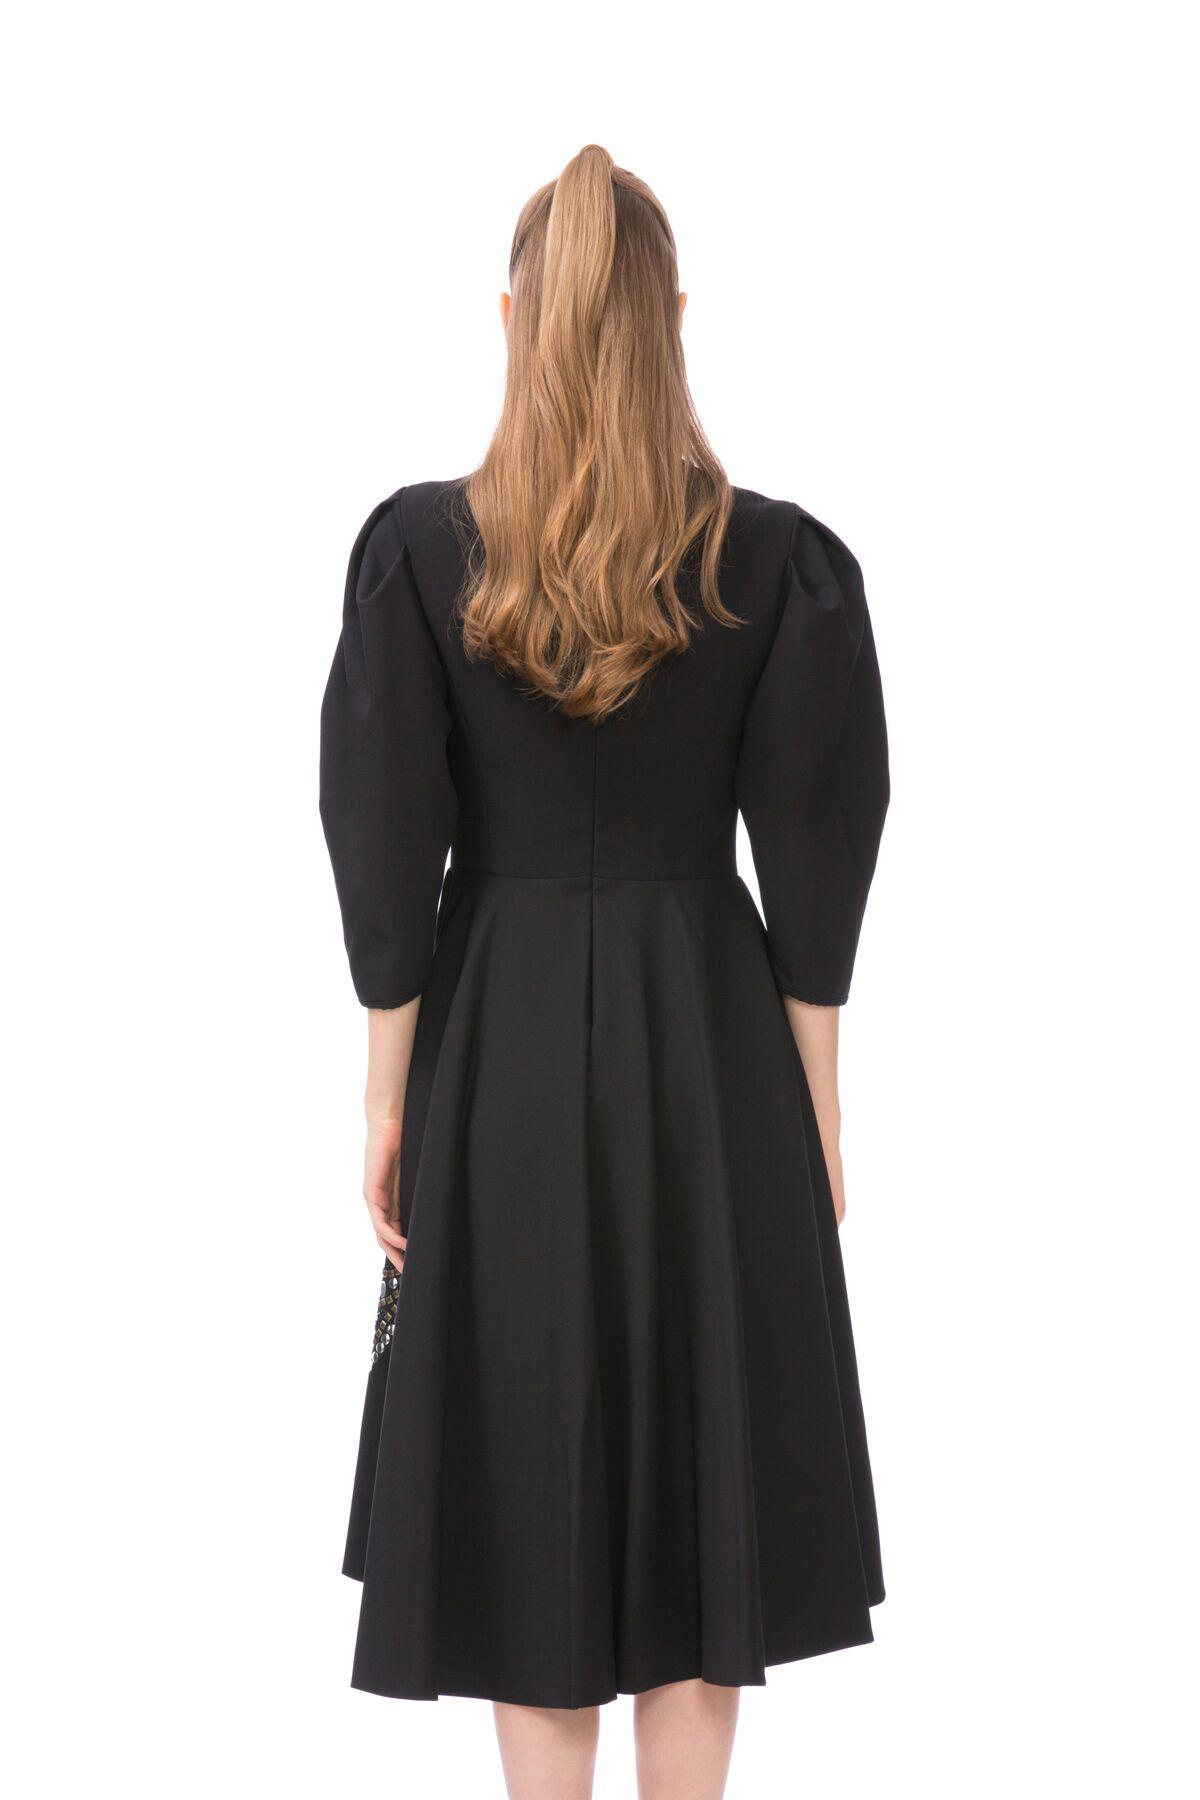 Trok Baskı Detaylı Siyah Midi Elbise